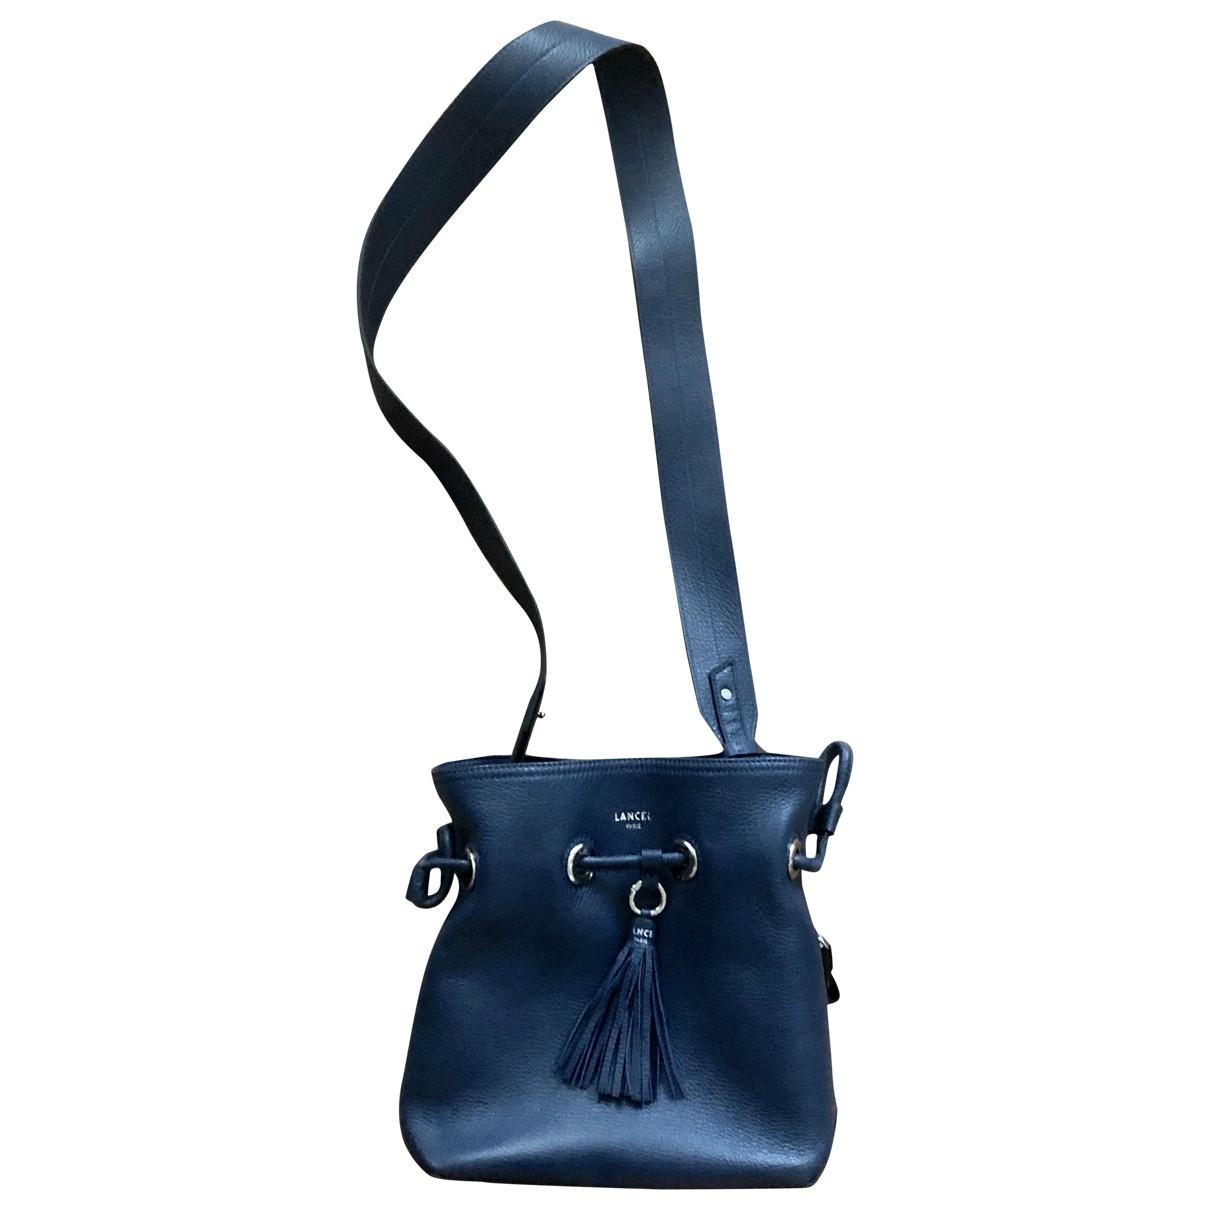 Lancel \N Blue Leather handbag for Women \N